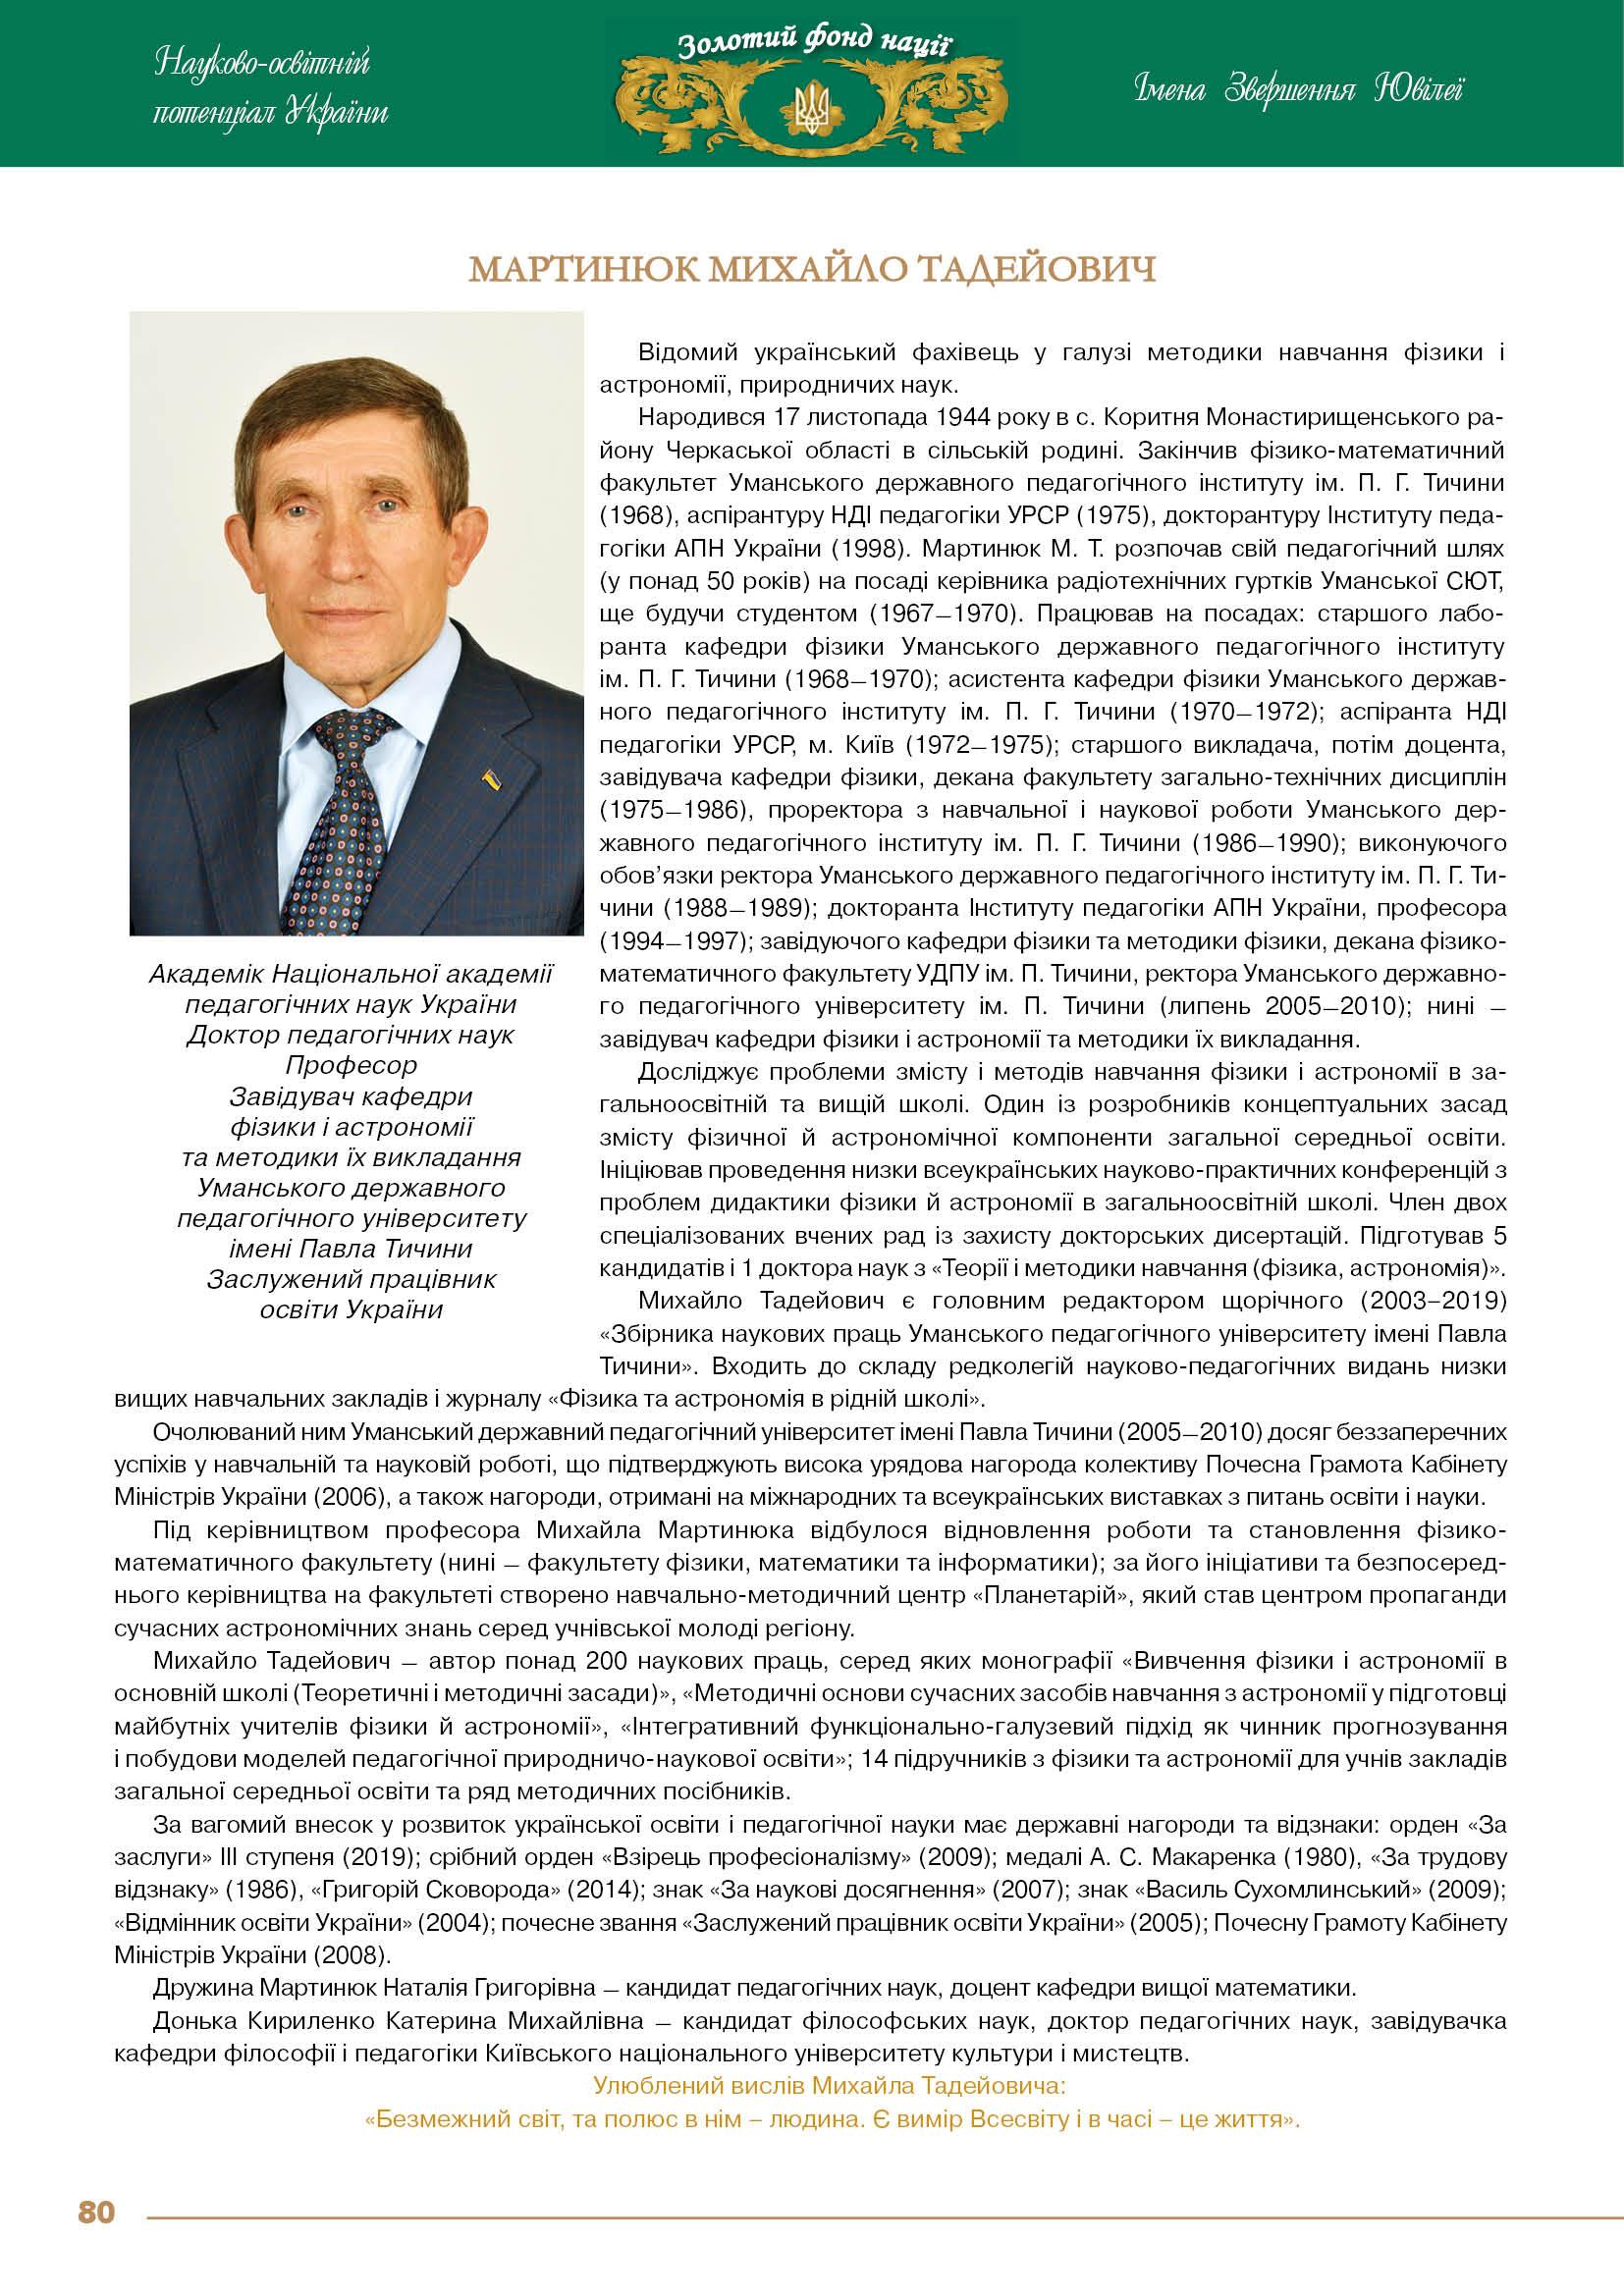 Мартинюк Михайло Тадейович